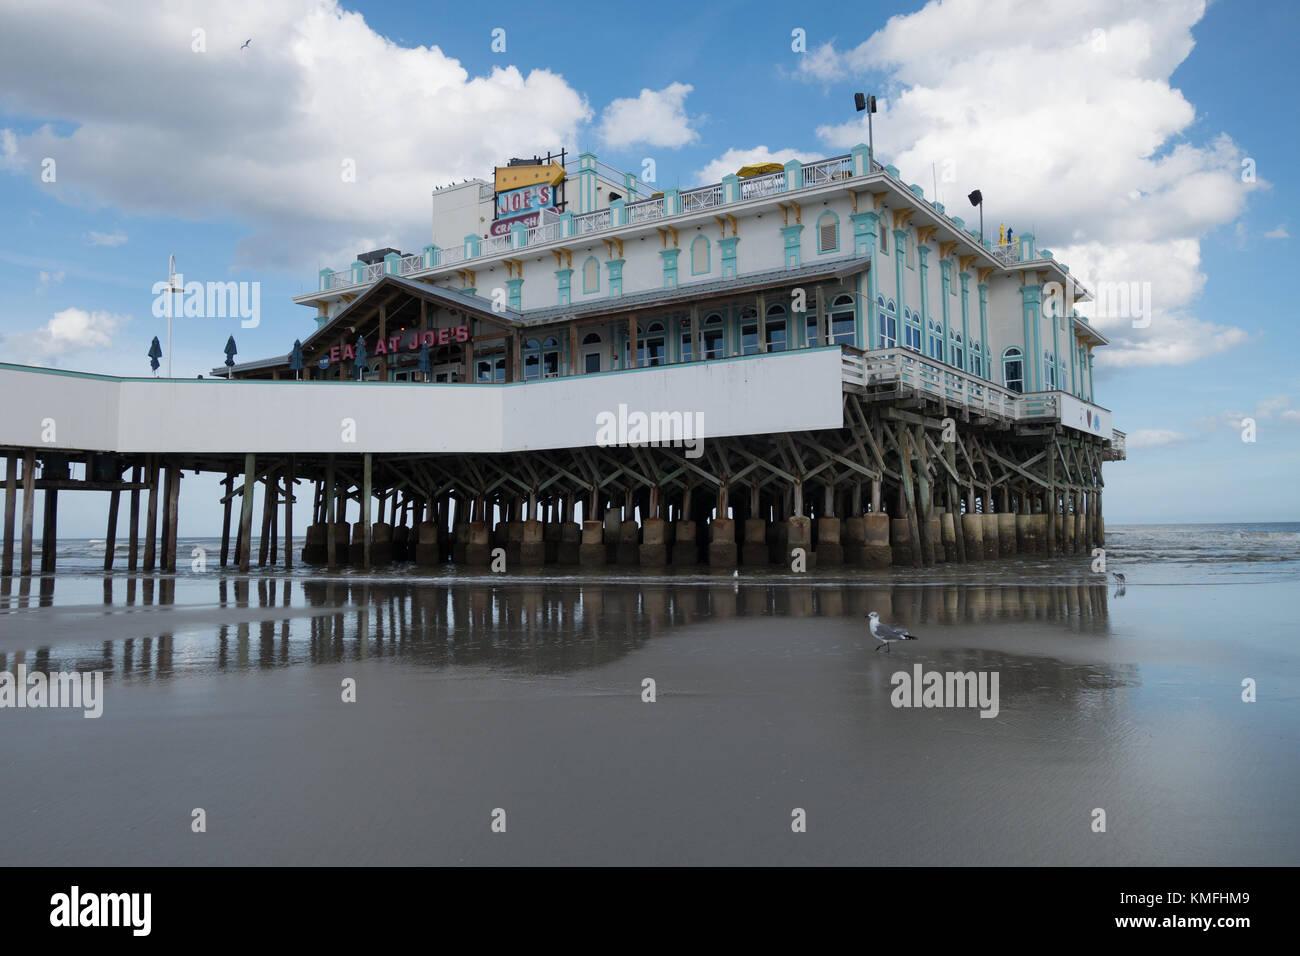 Daytona Beach Pier Restaurant